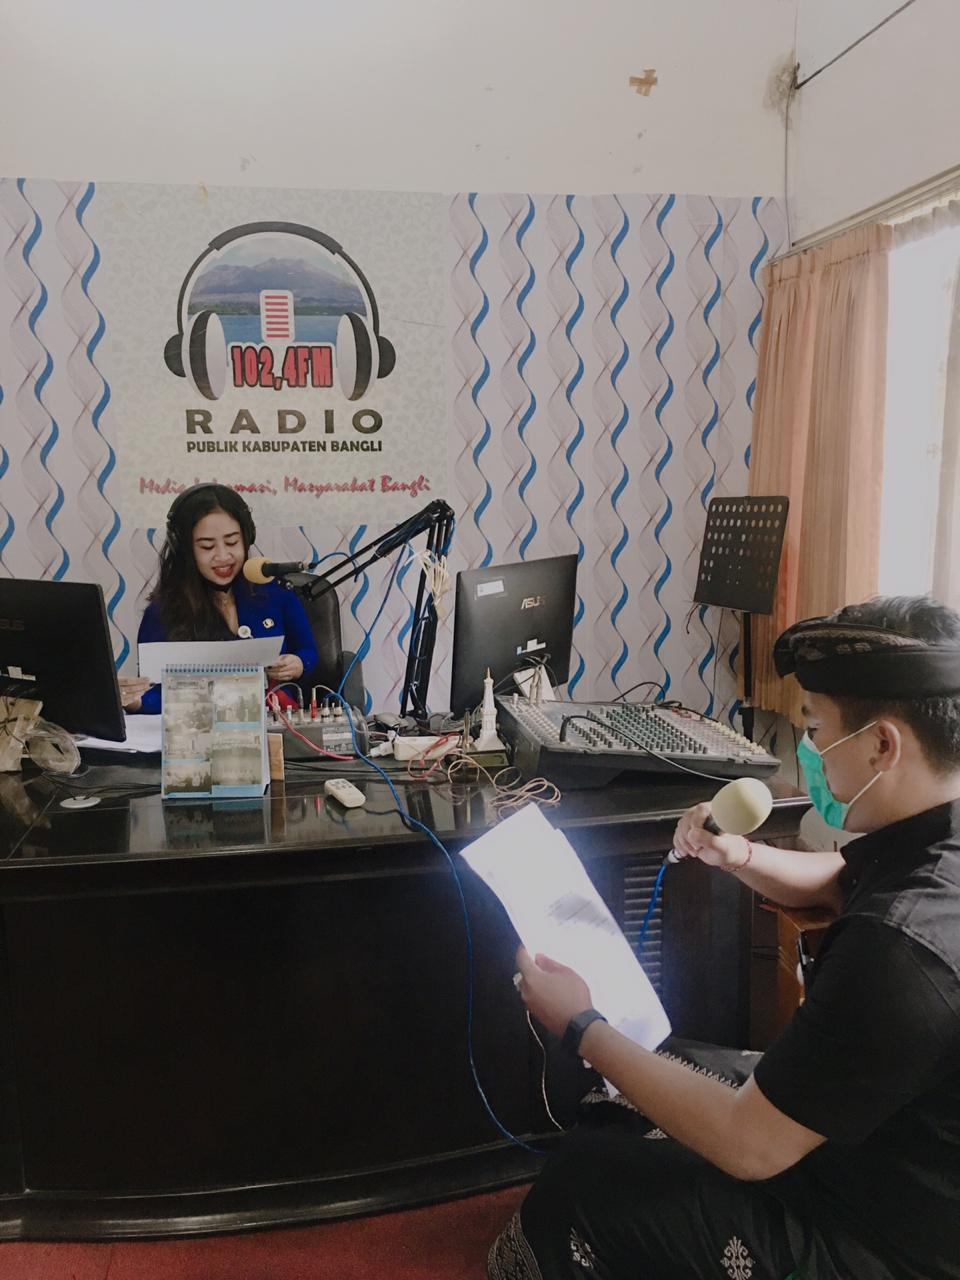 SOSIALISASI PERBUP PROTOKOL KESEHATAN MELALUI RADIO PUBLIK KABUPATEN BANGLI